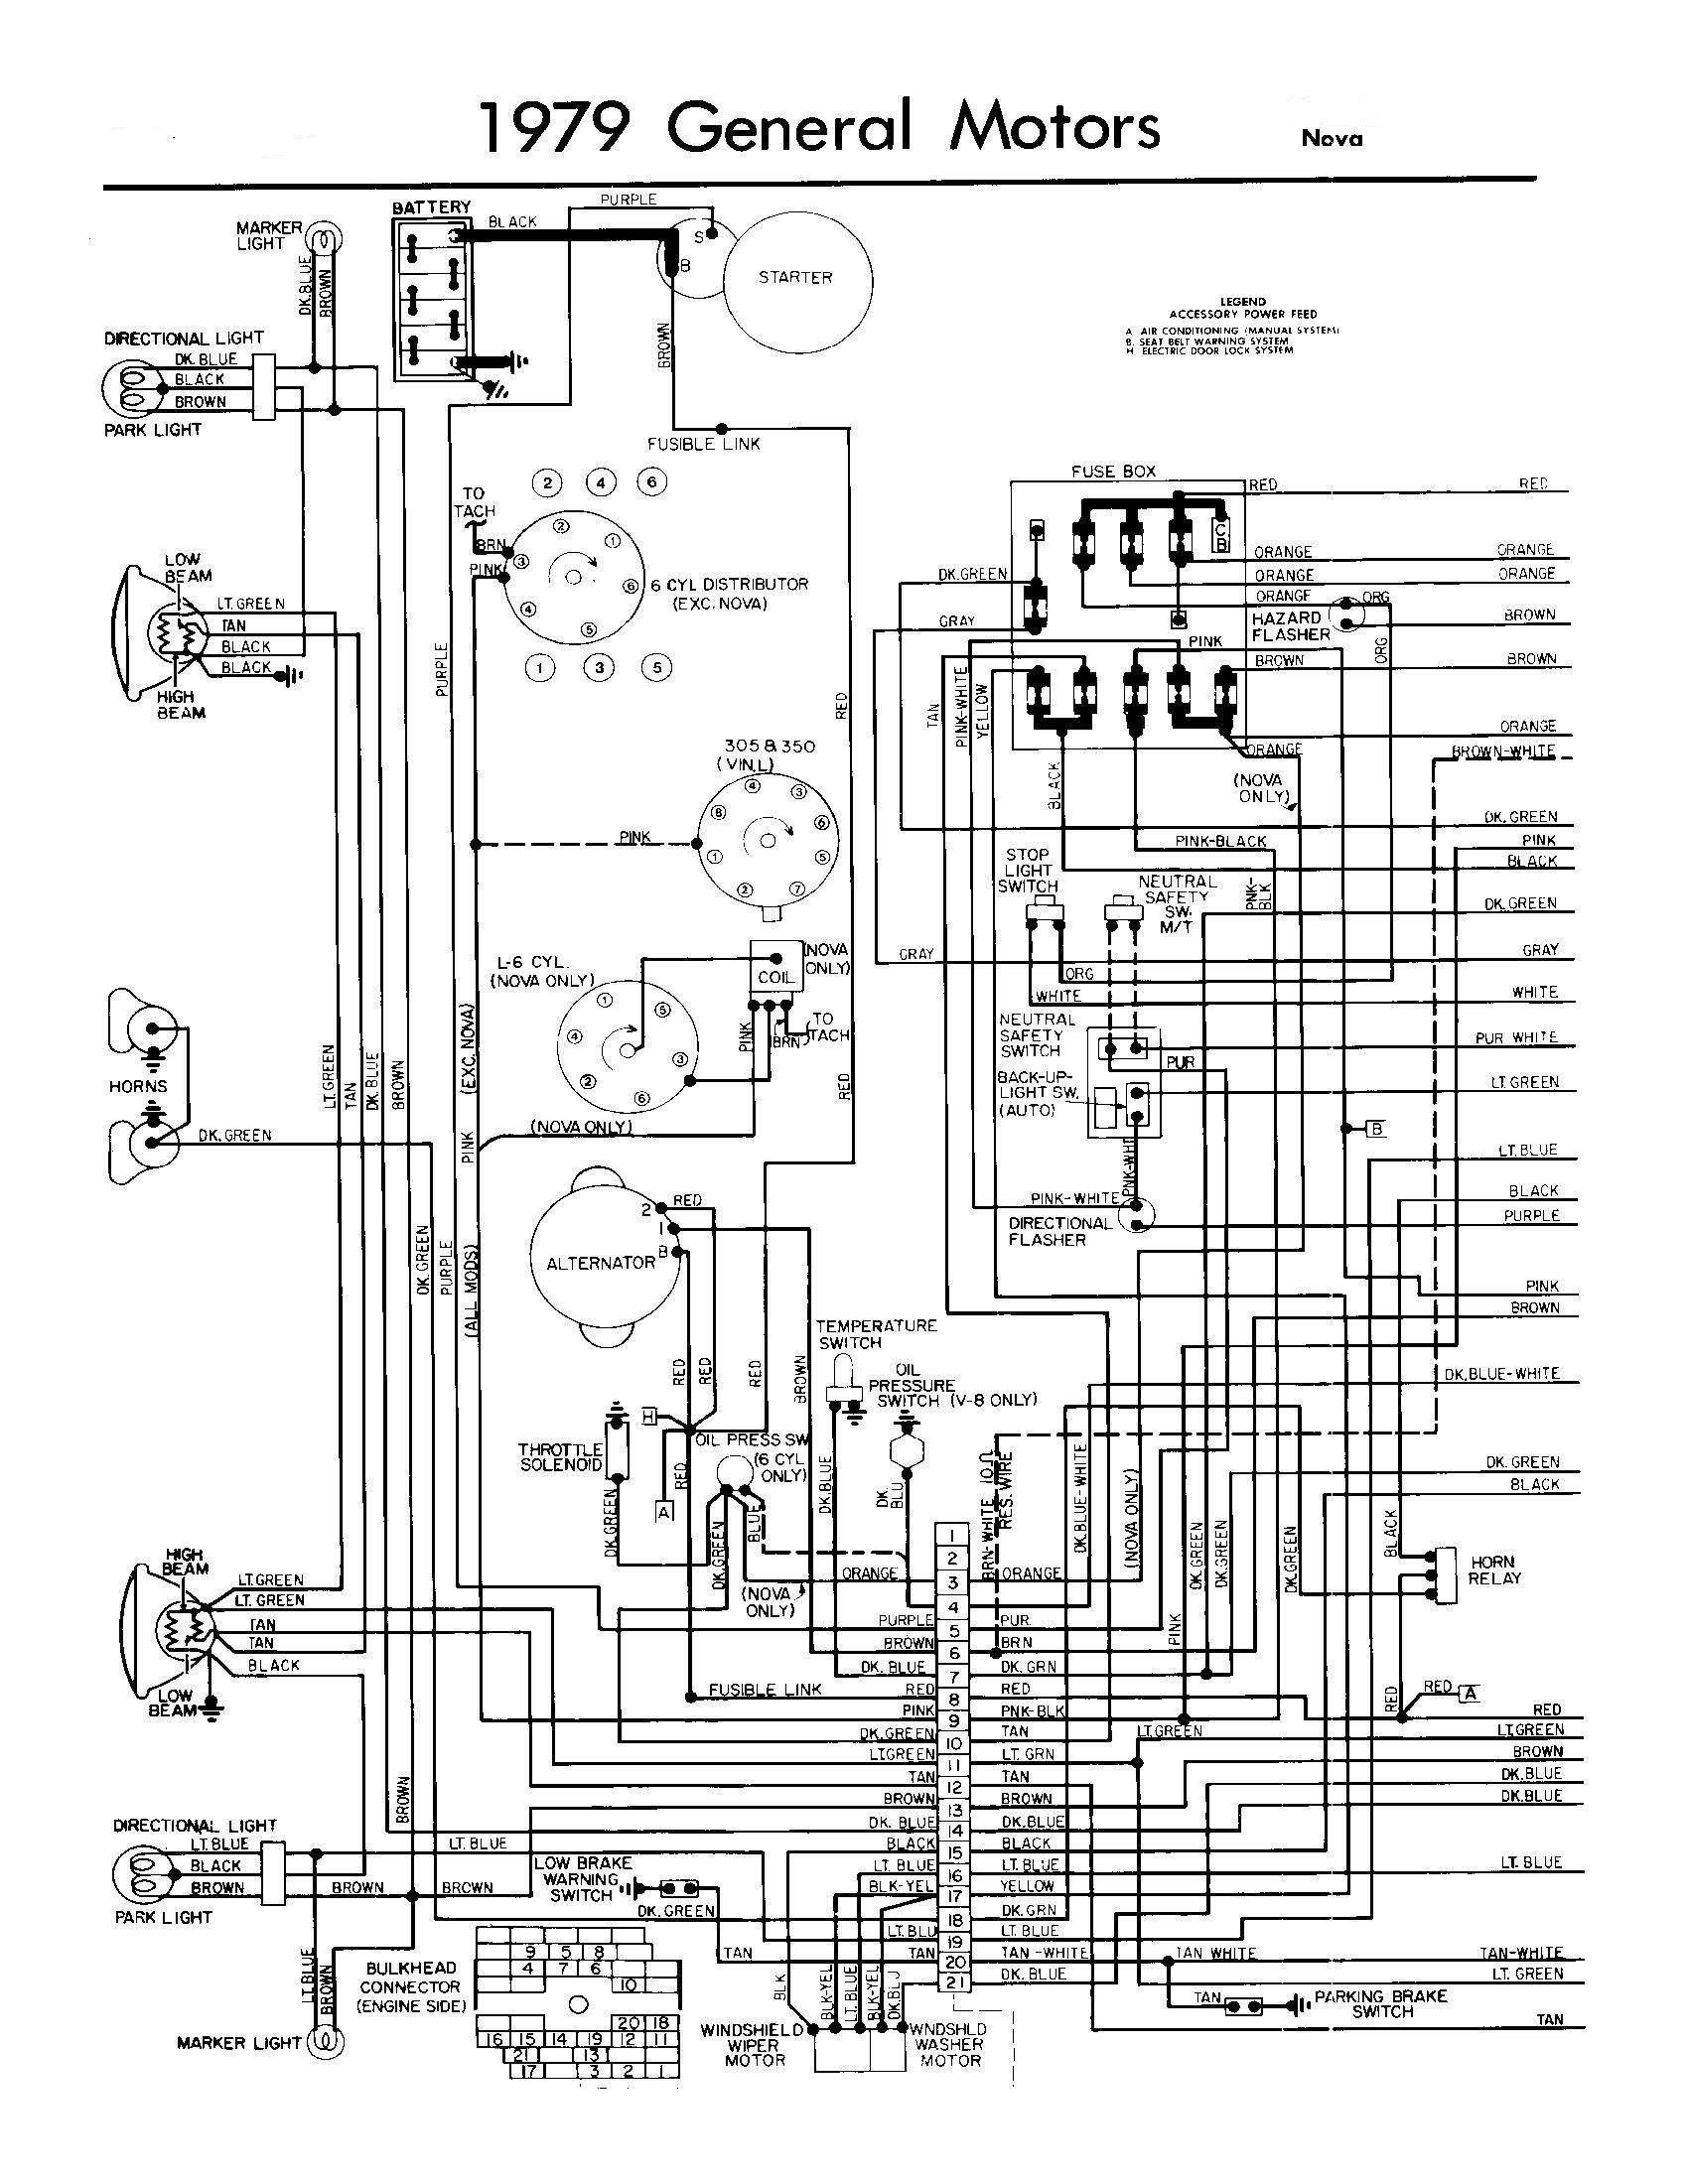 78 Chevy Truck Wiring Diagram In 2021 Engine Diagram Alternator Wiring Diagram Chevy Trucks